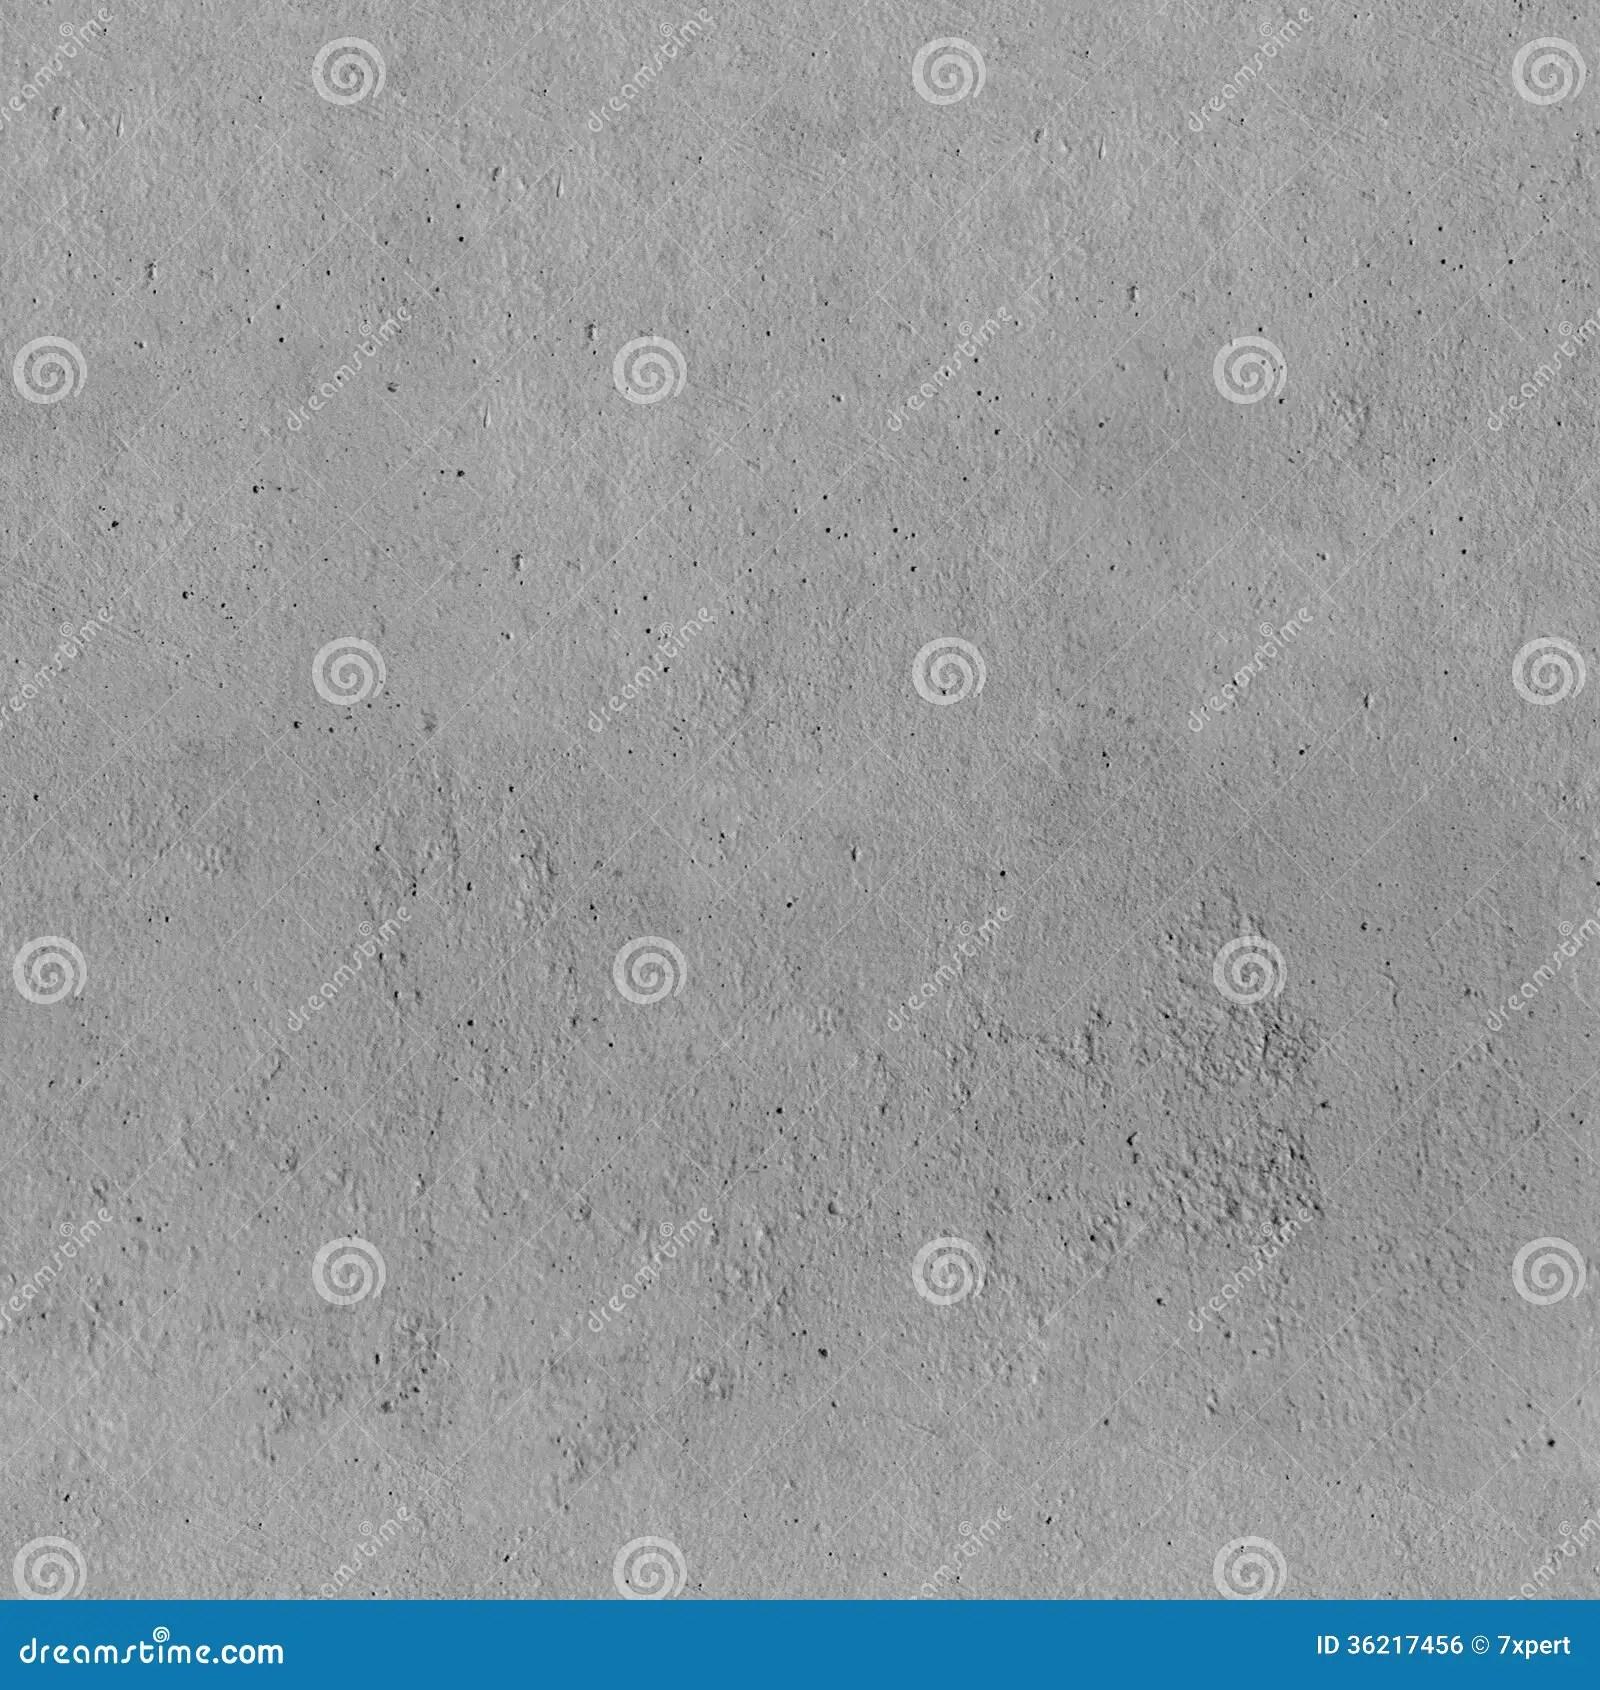 Seamless Concrete Texture Stock Photo Image Of Grainy